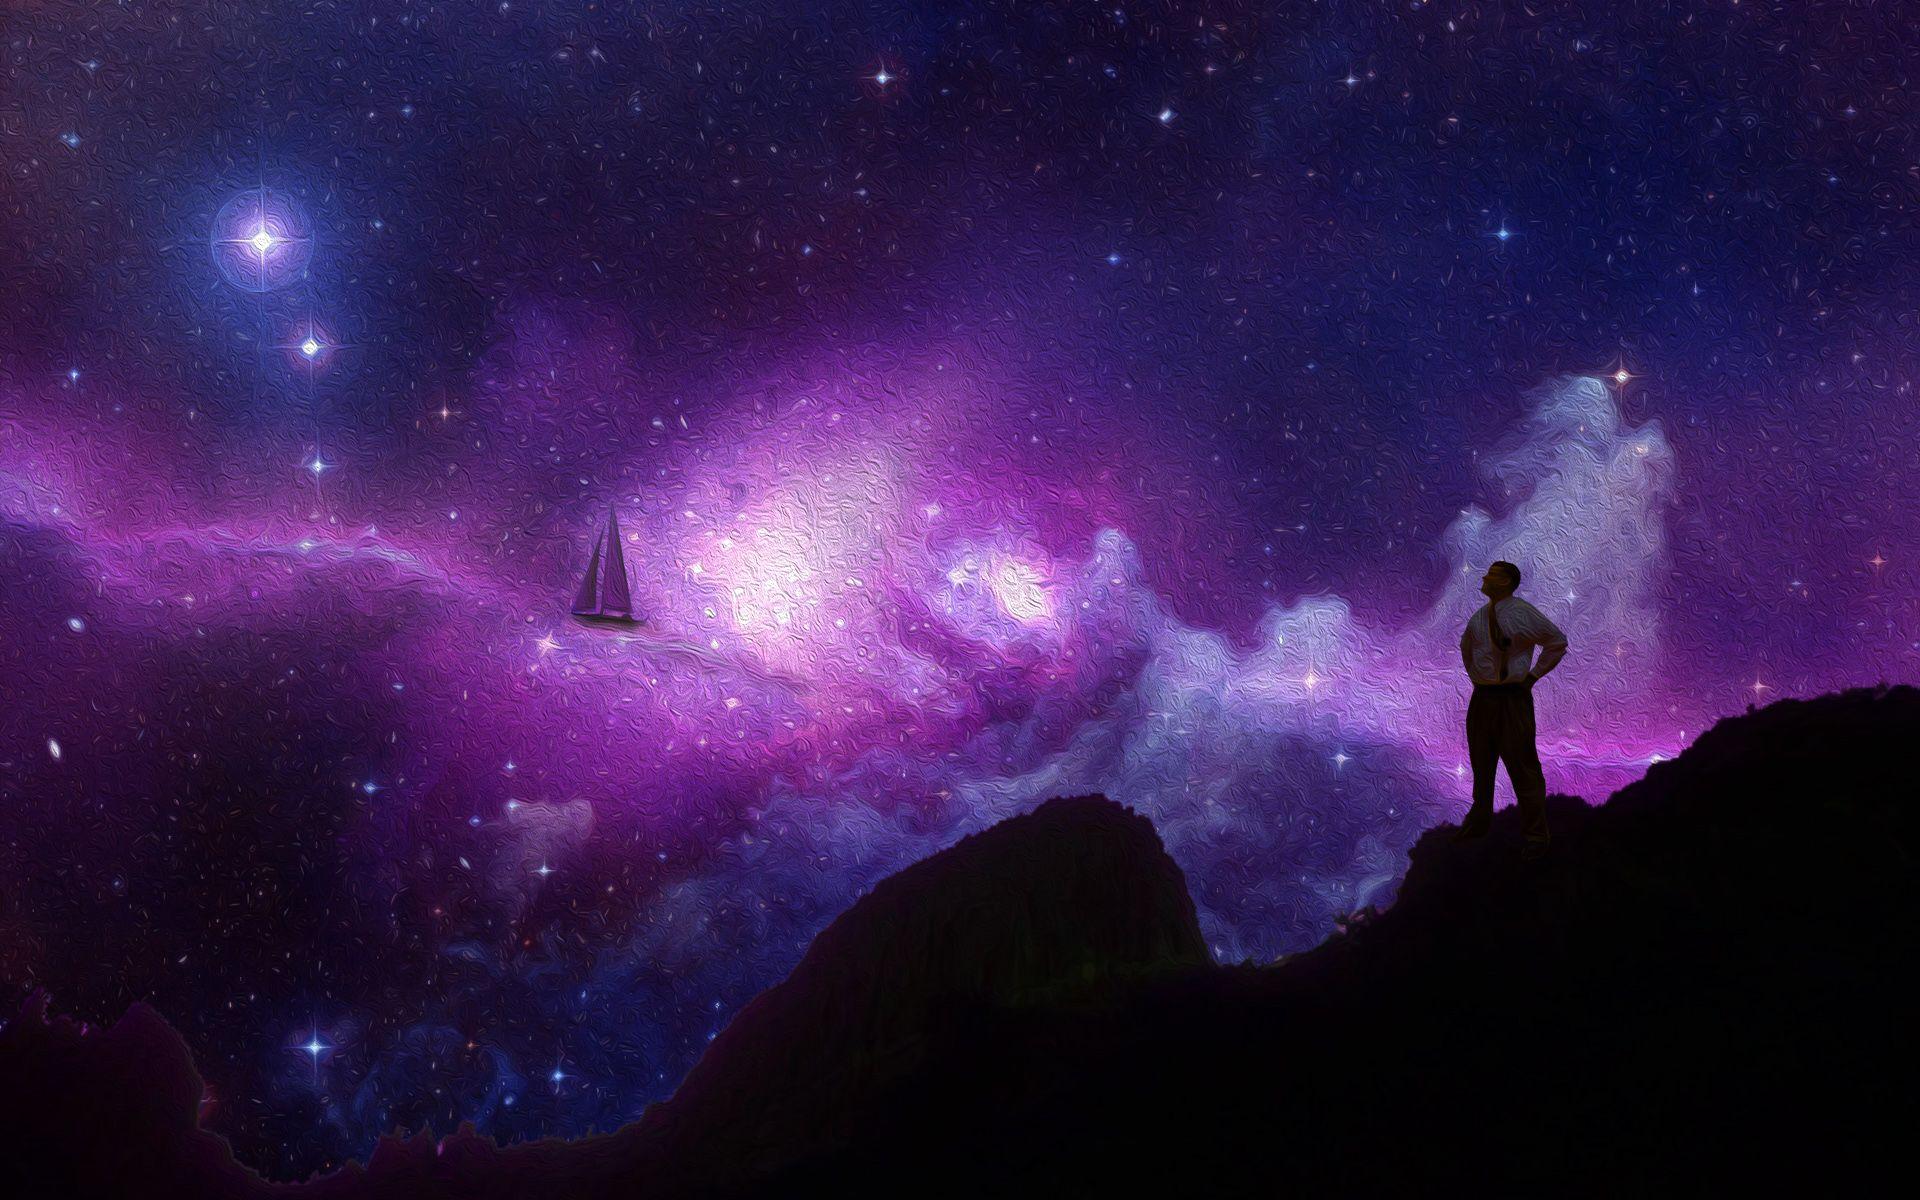 A Dream Among The Stars Aaron Blaylock Blue galaxy